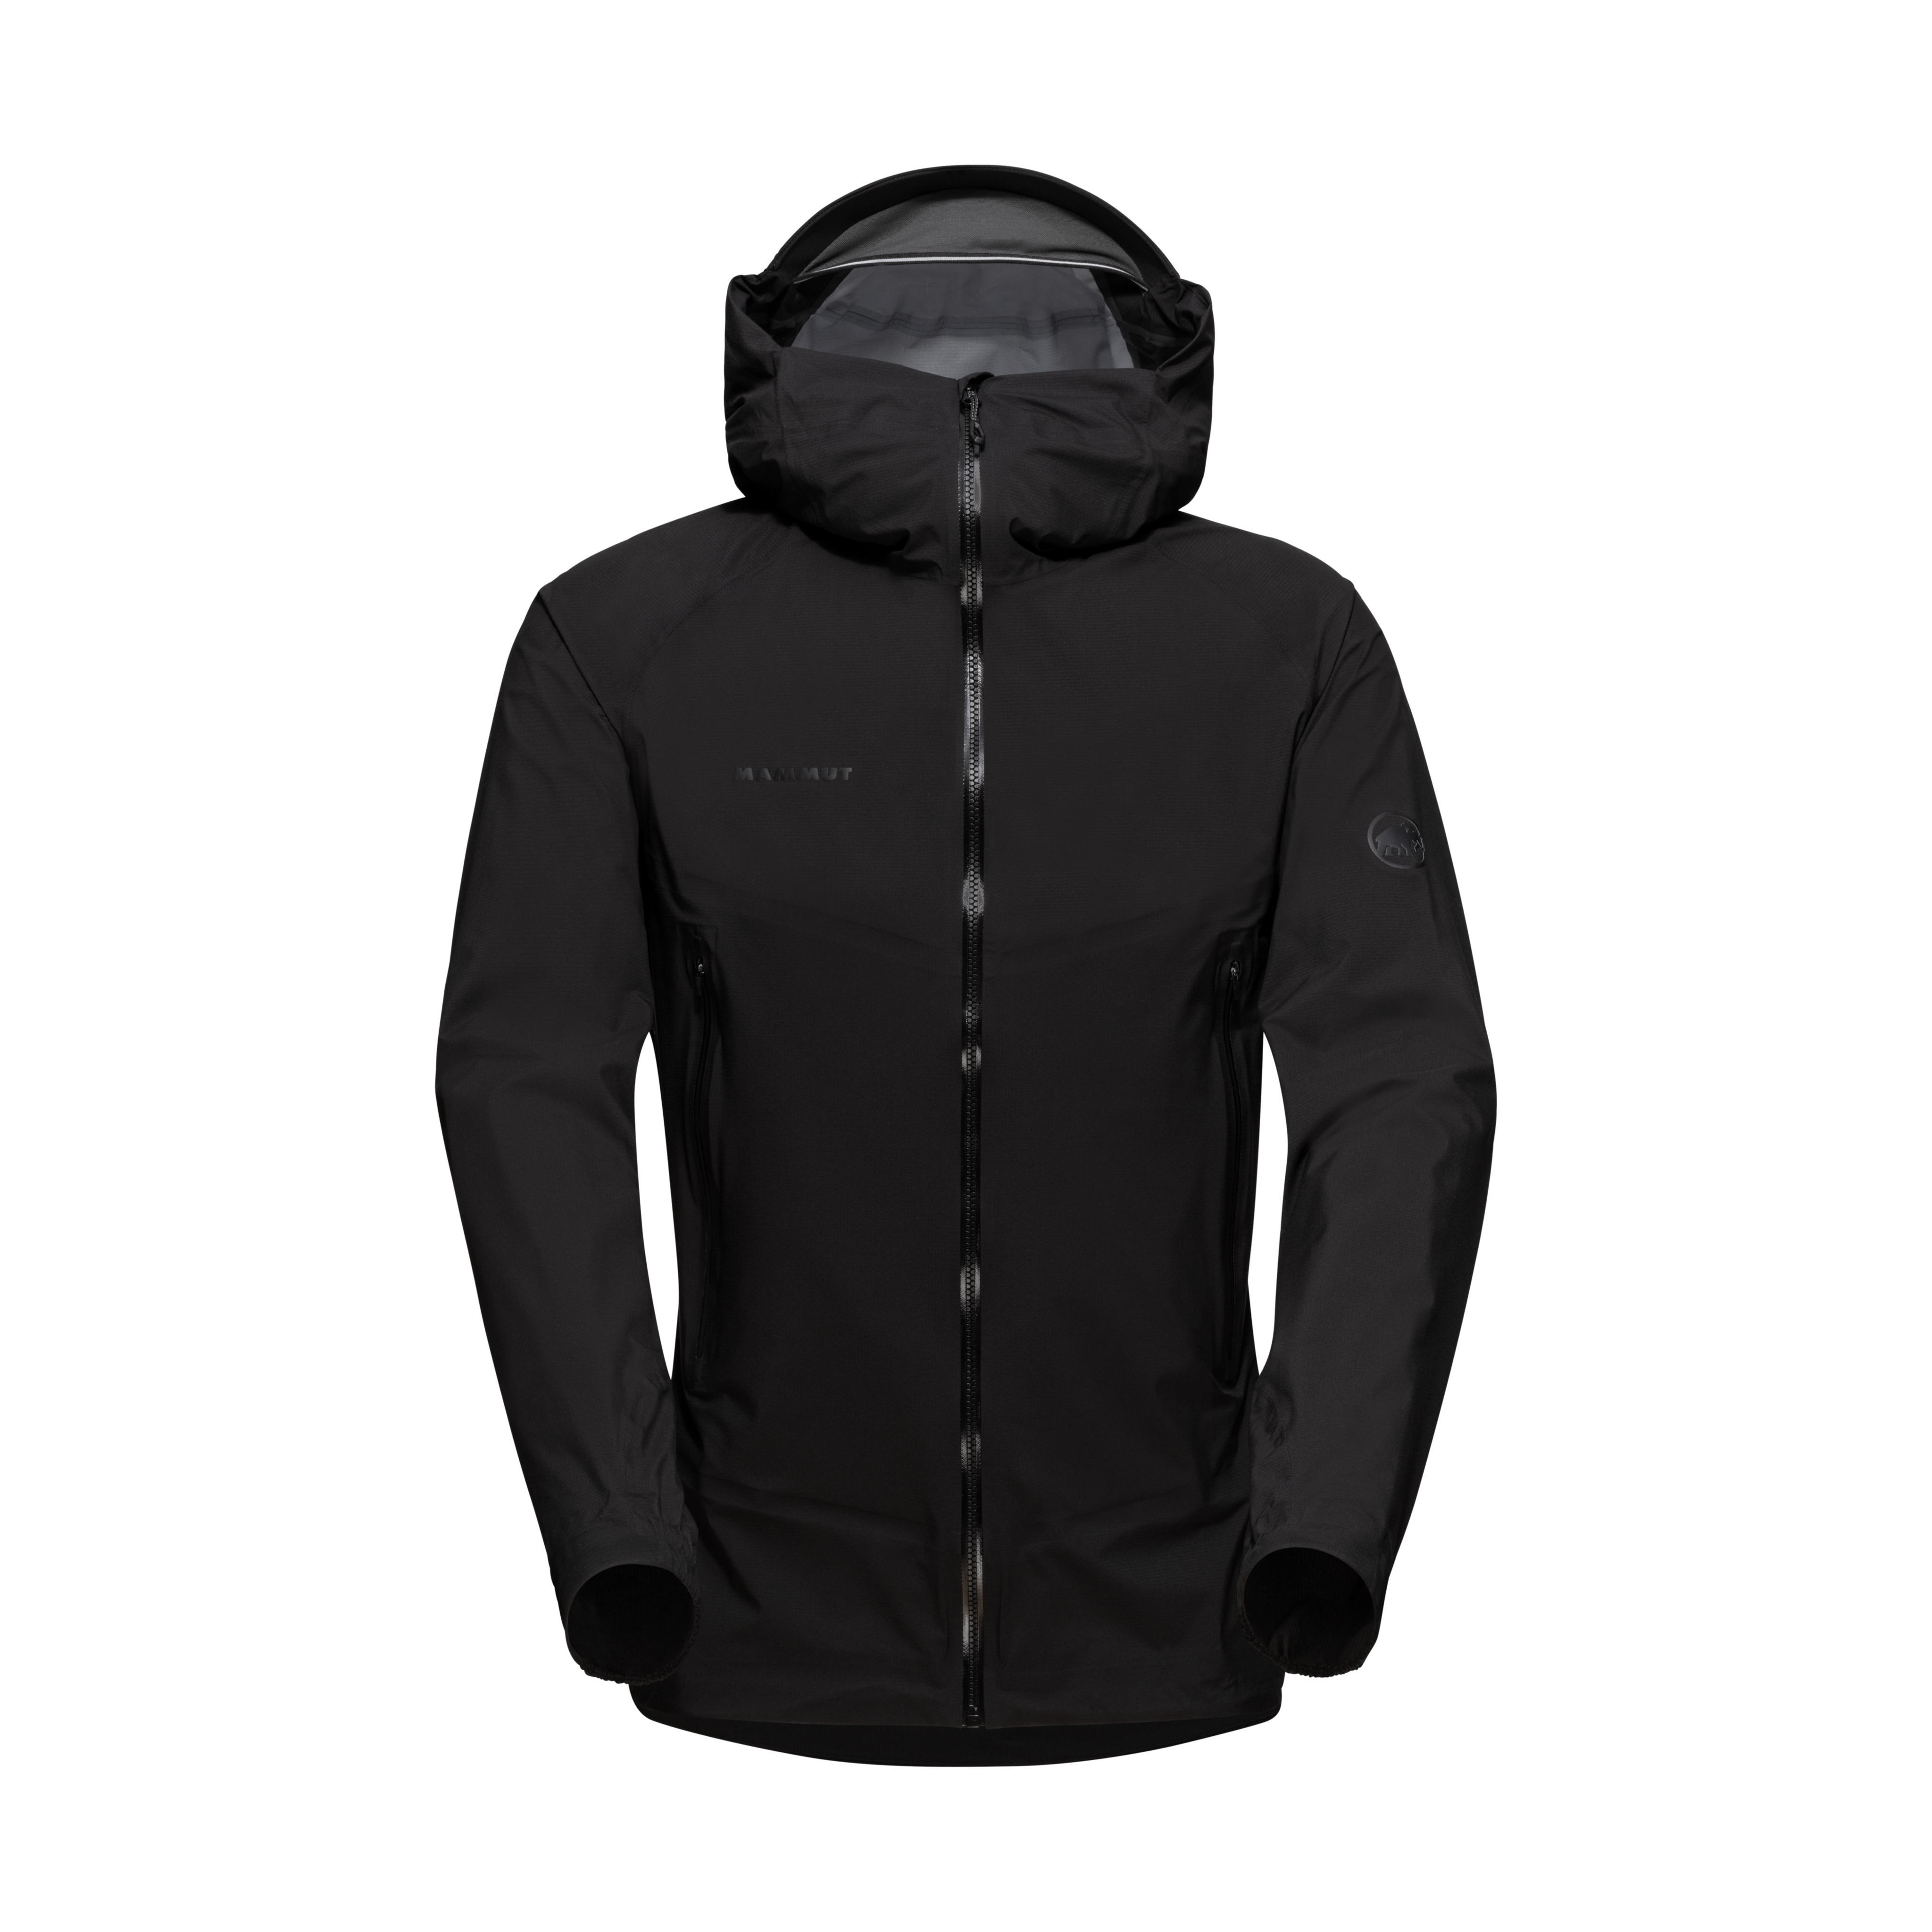 Masao Light HS Hooded Jacket Men - black-phantom, S thumbnail